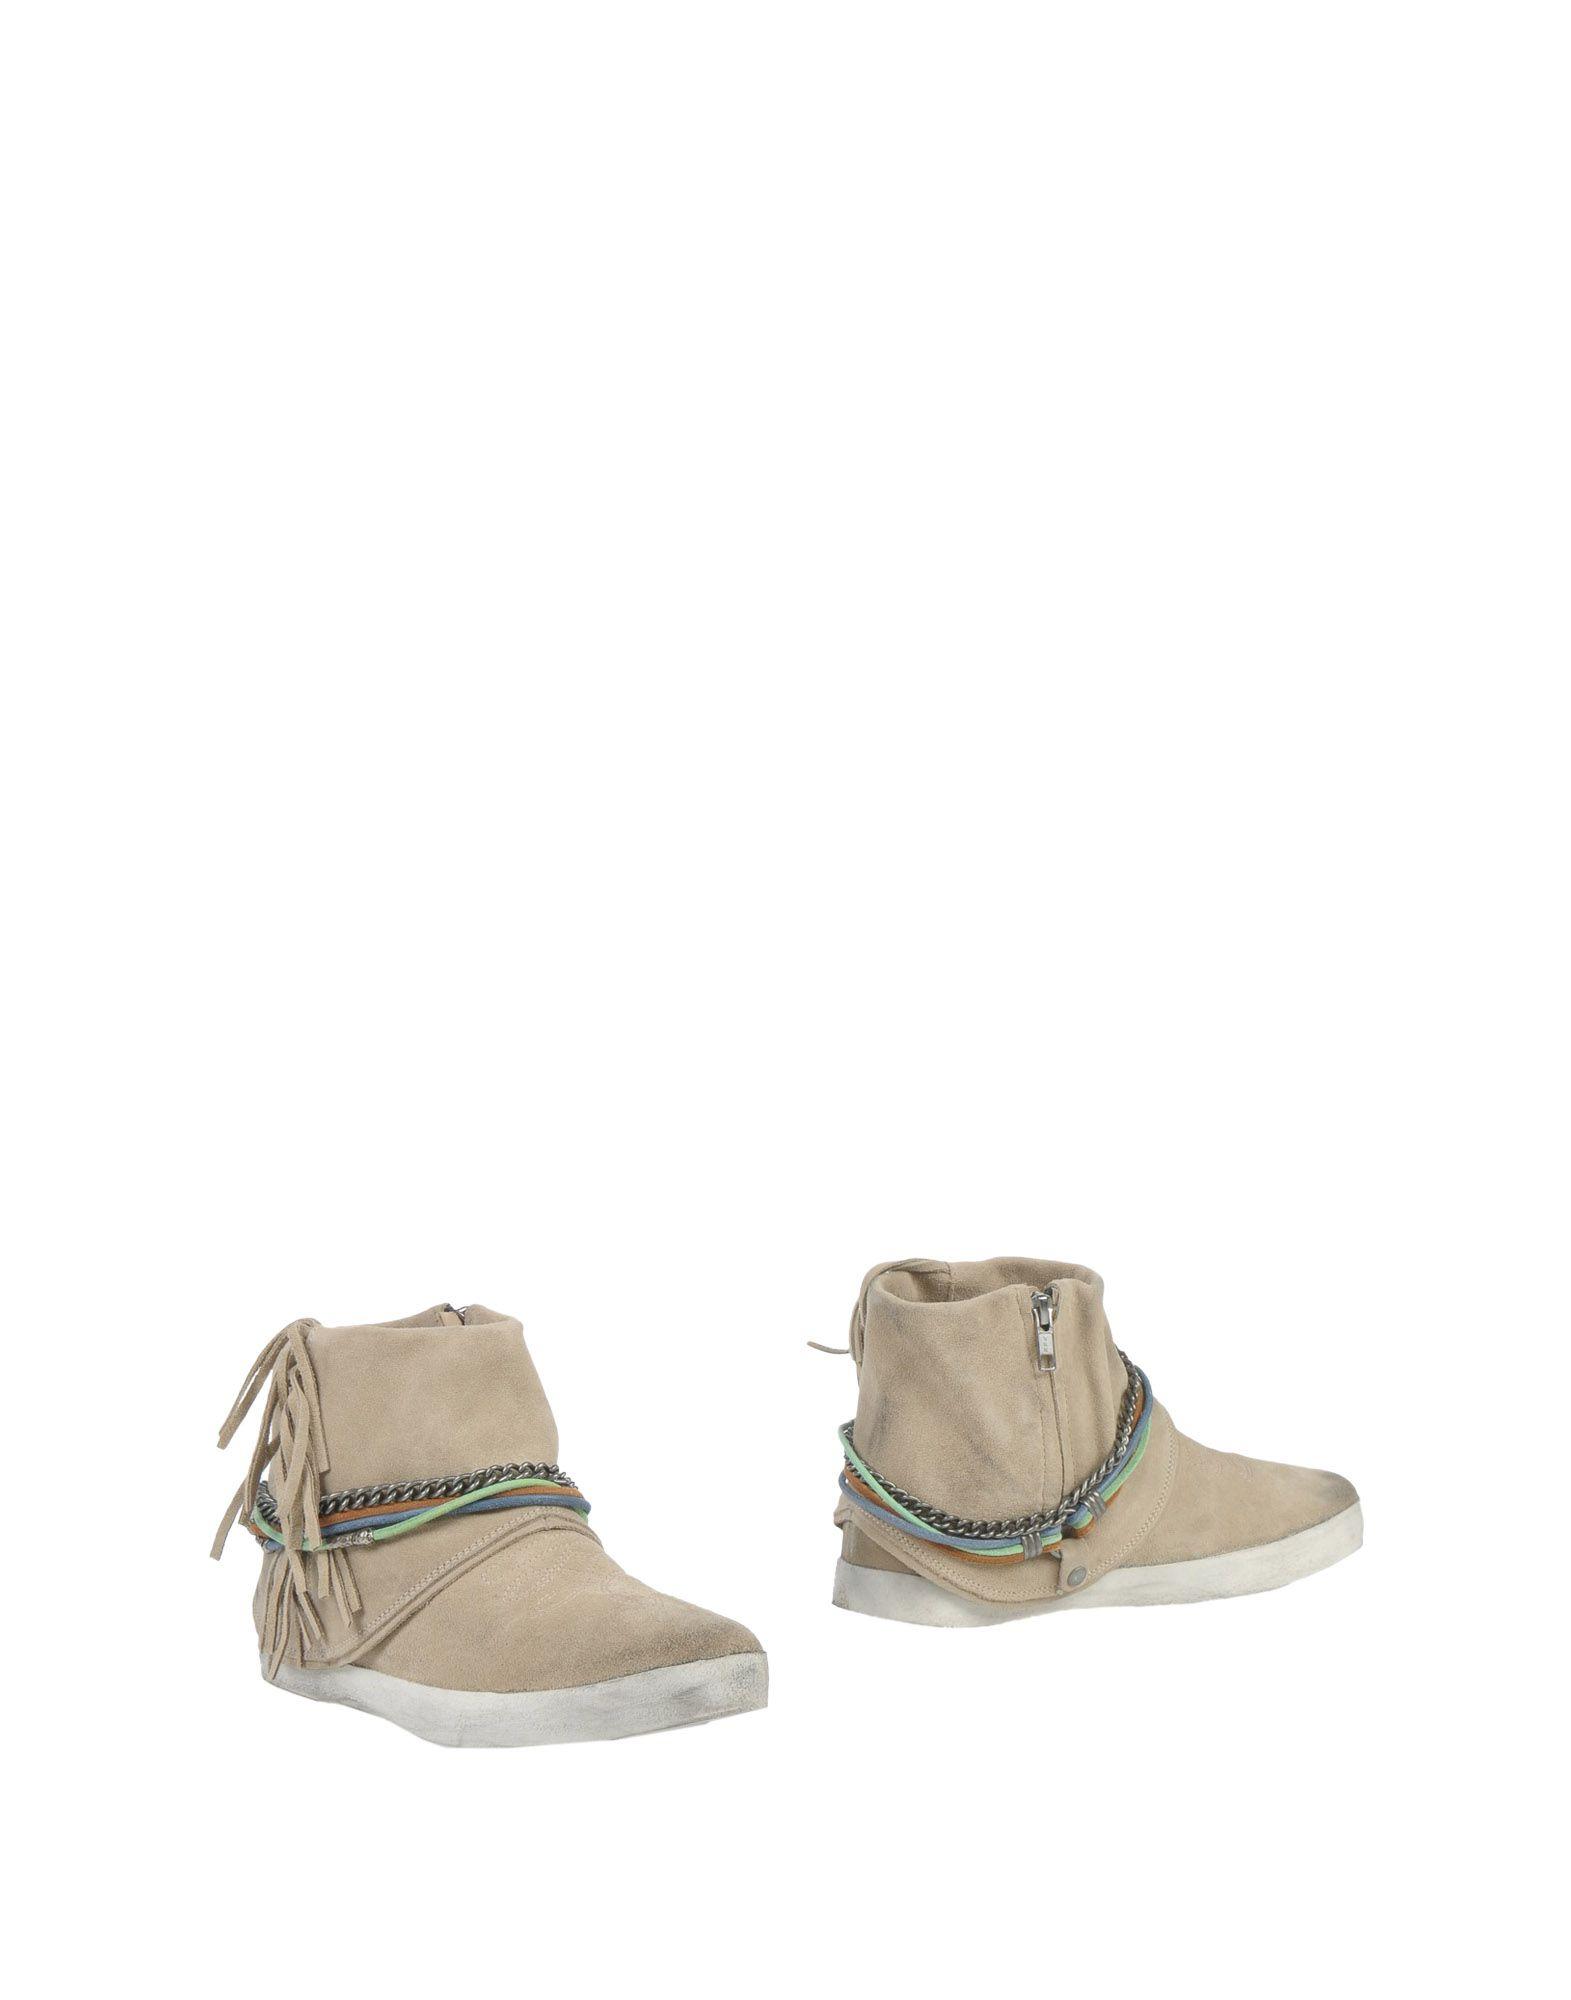 Catarina Martins Stiefelette Damen  11396048KA Gute Qualität beliebte Schuhe